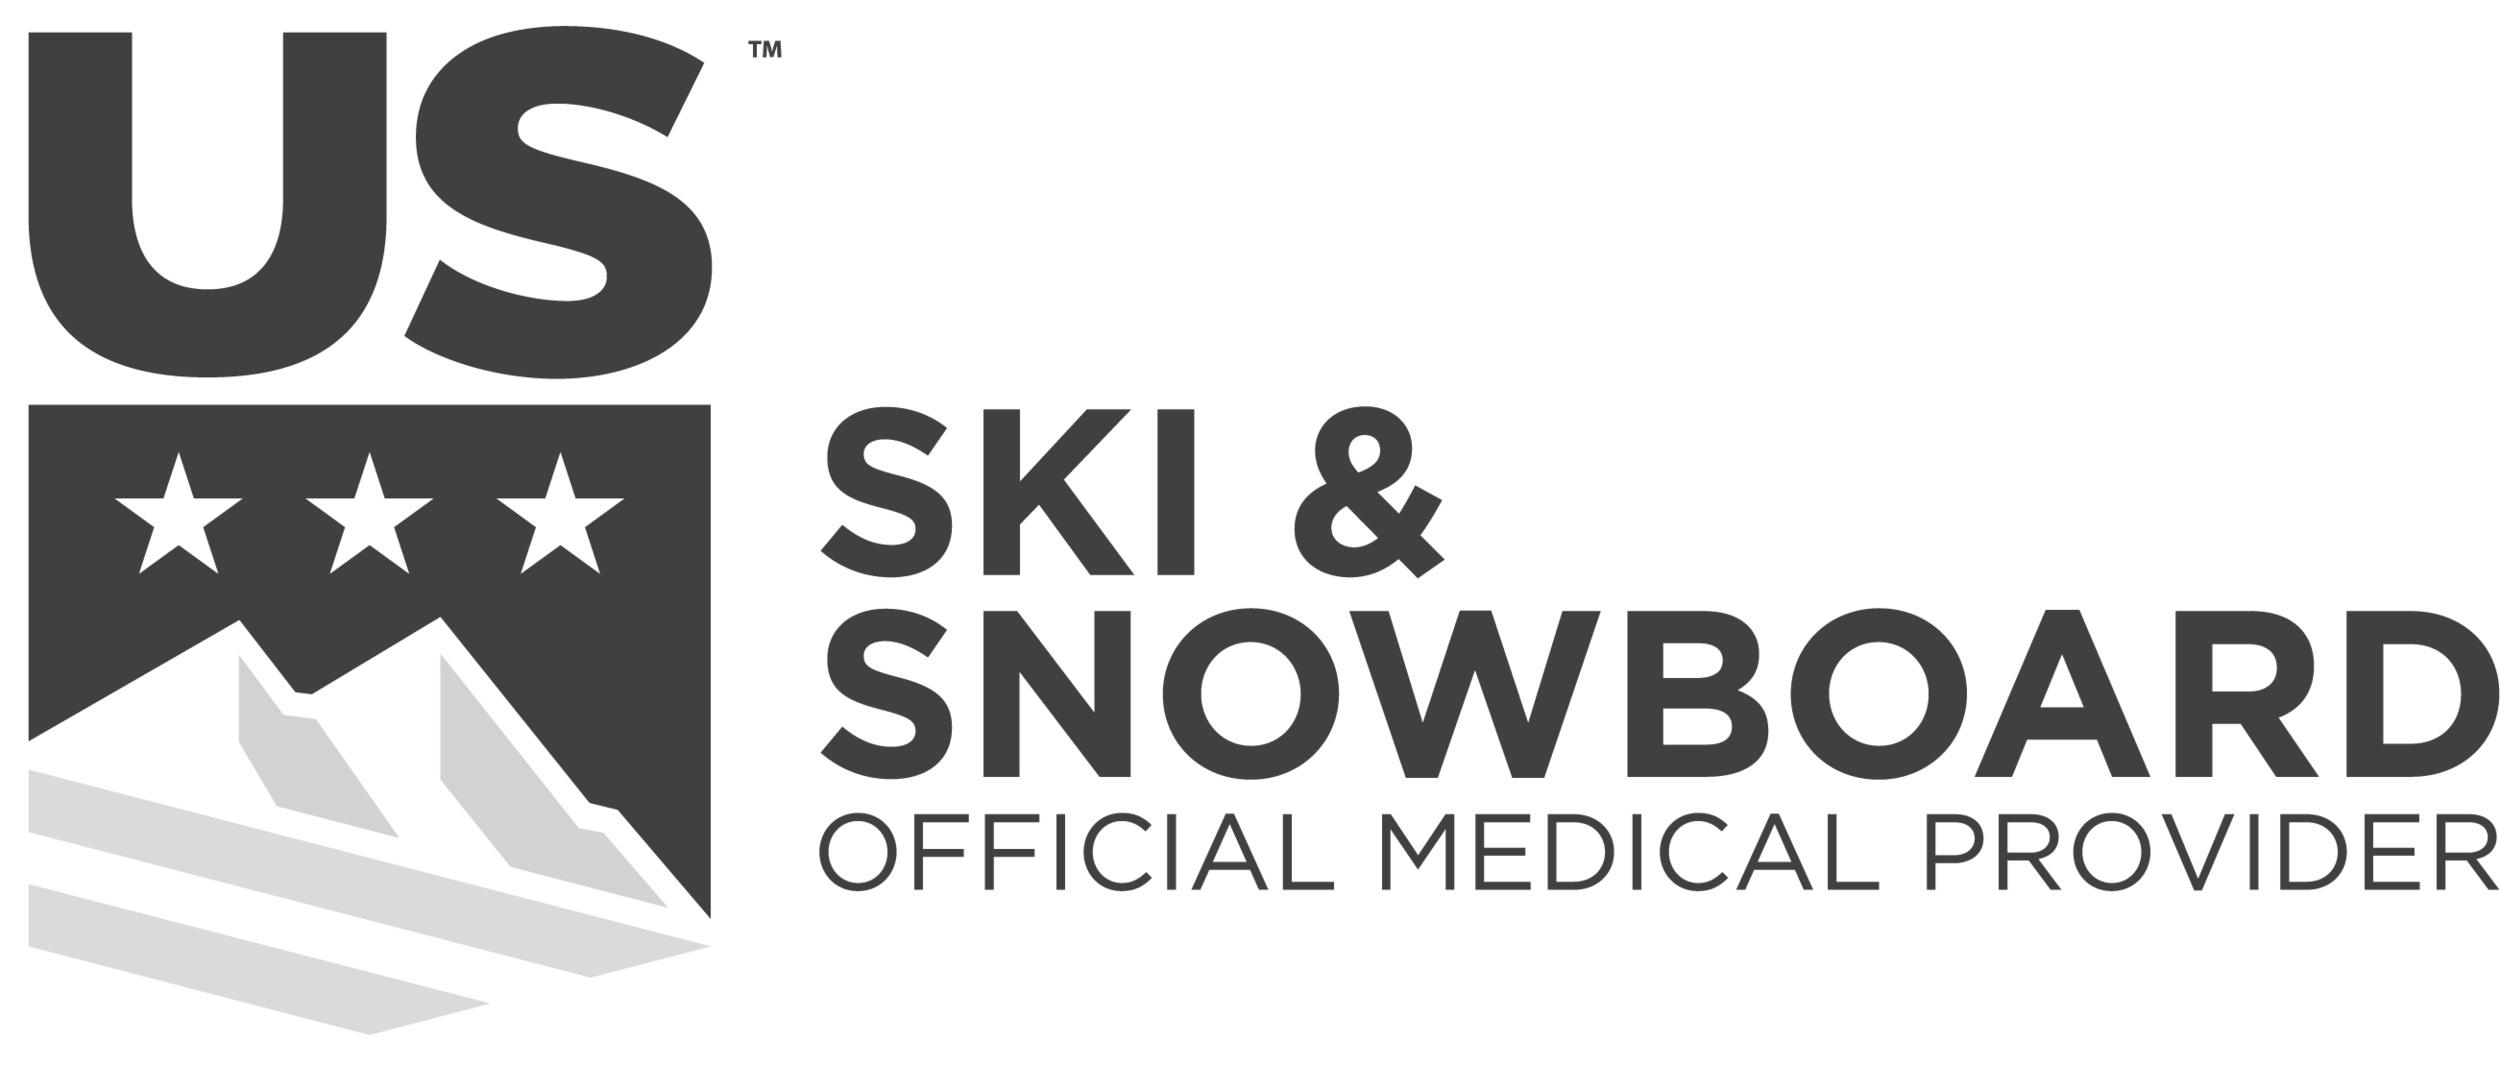 US+Ski+and+Snowboard_Official+Medical+Provider.jpg